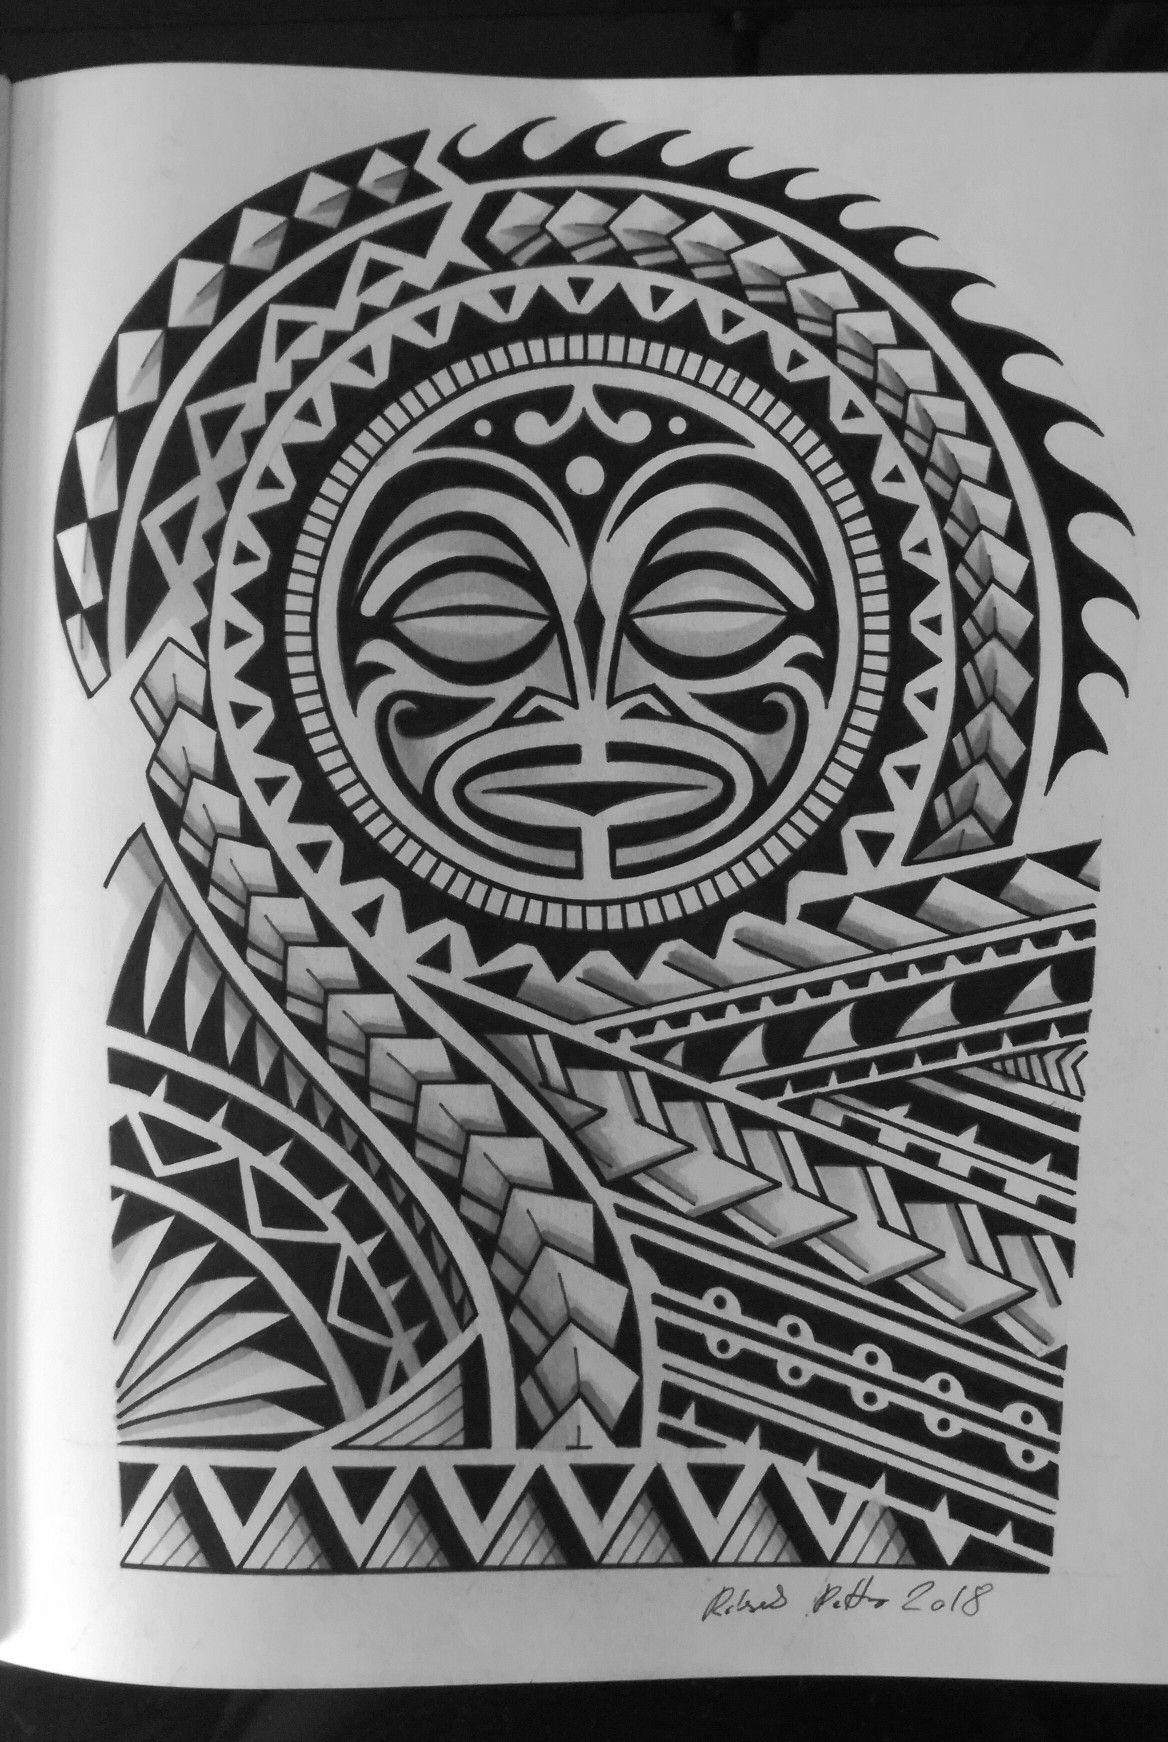 Tattoo Flash Maori: Tatuagem Maui, Desenhos Maori E Maori